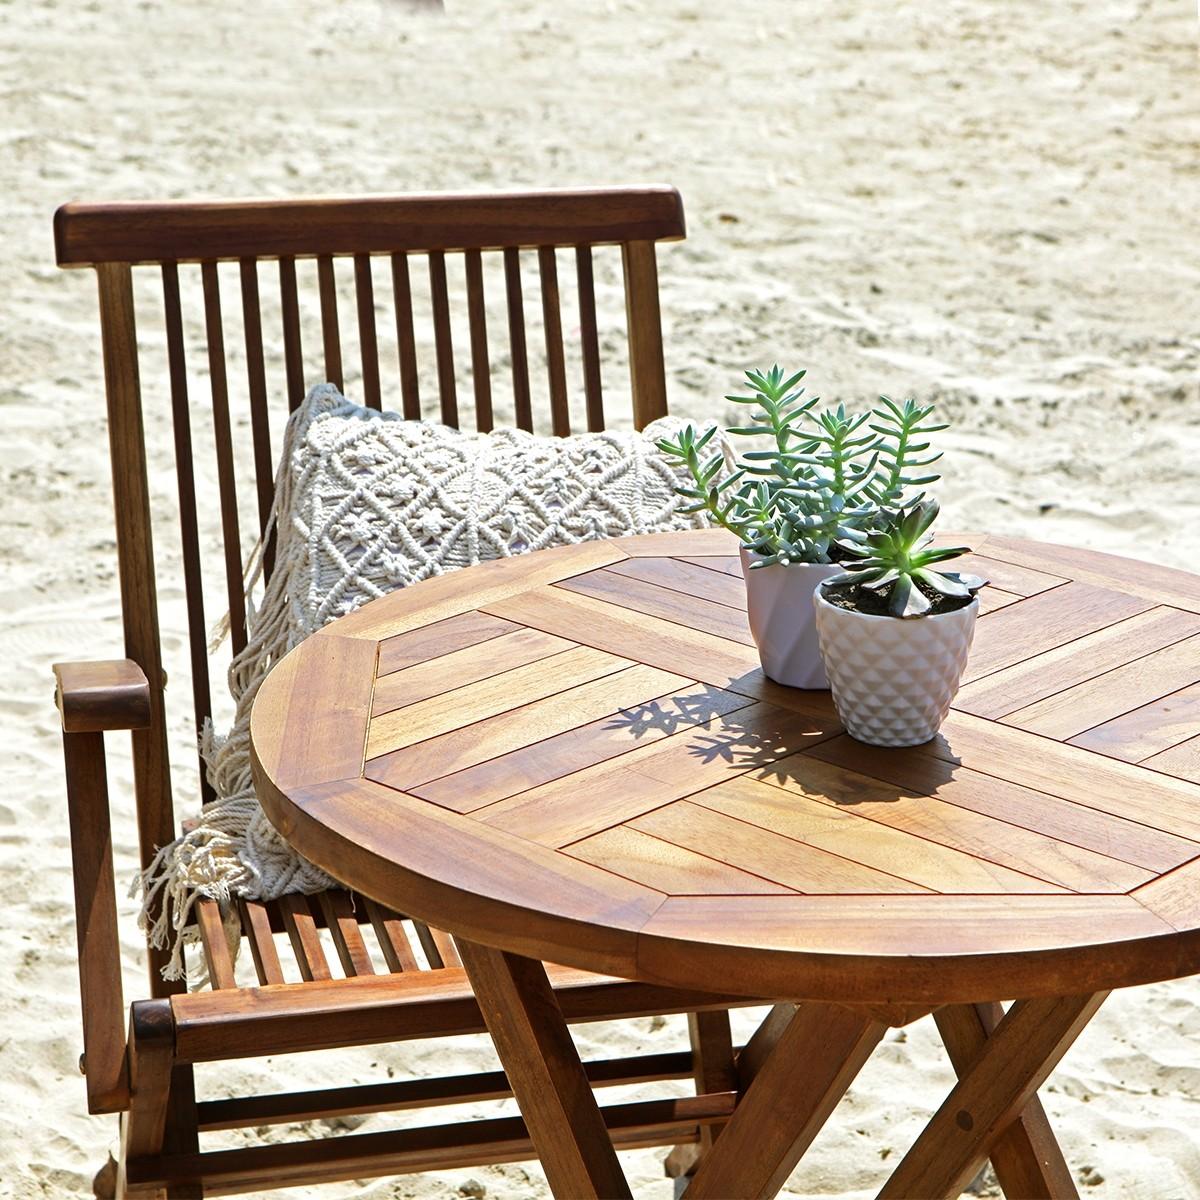 salon de jardin en bois de teck huil 2 4 places bali. Black Bedroom Furniture Sets. Home Design Ideas